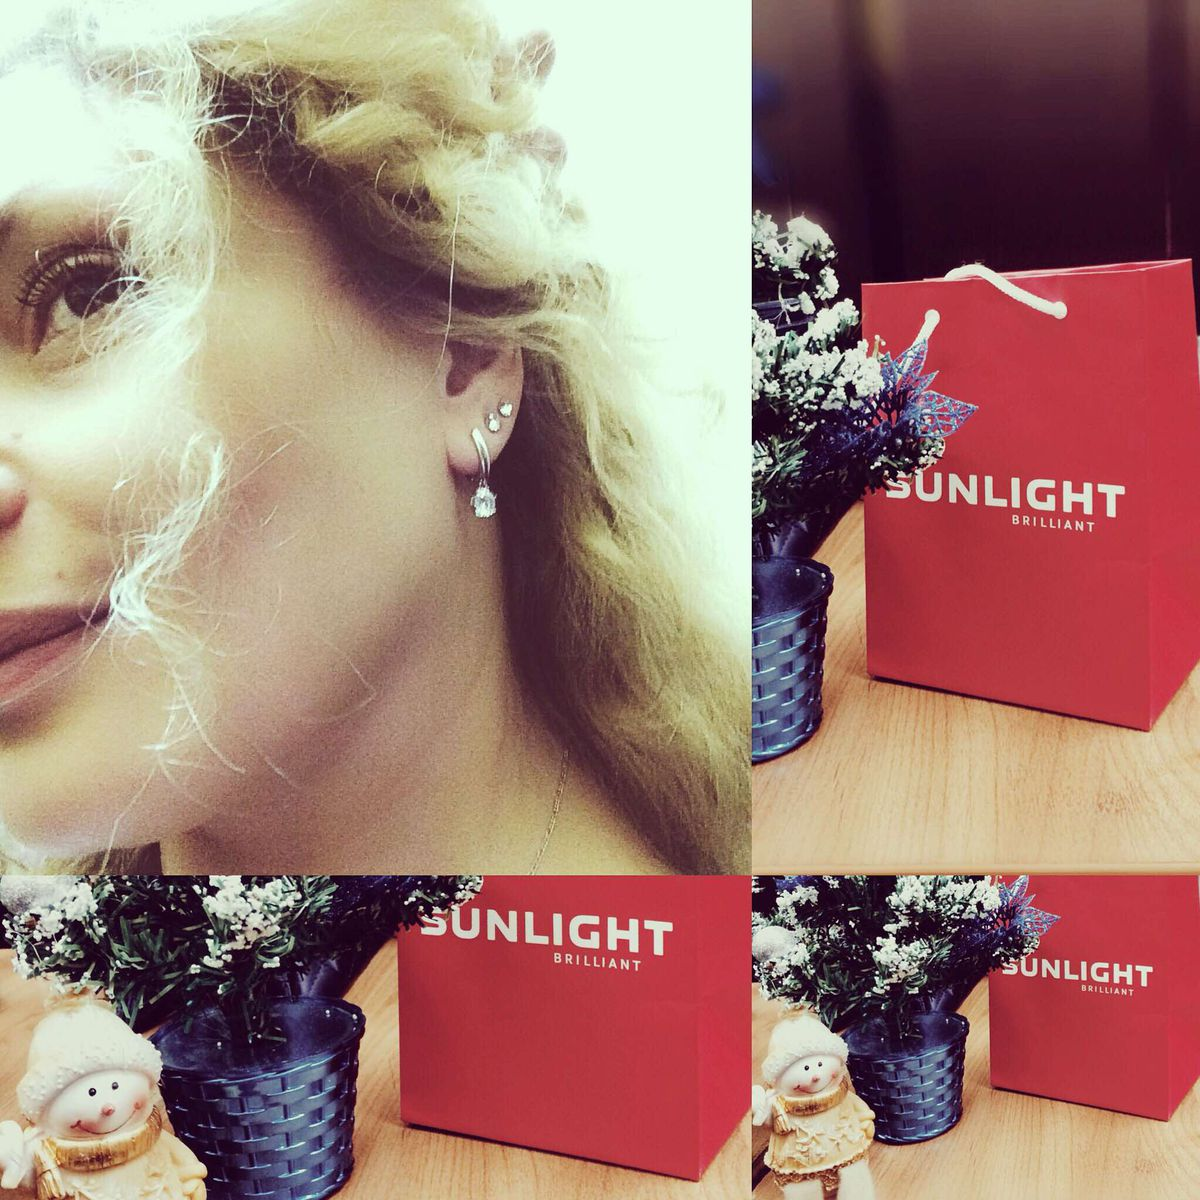 Серьги от SUNLIGHT